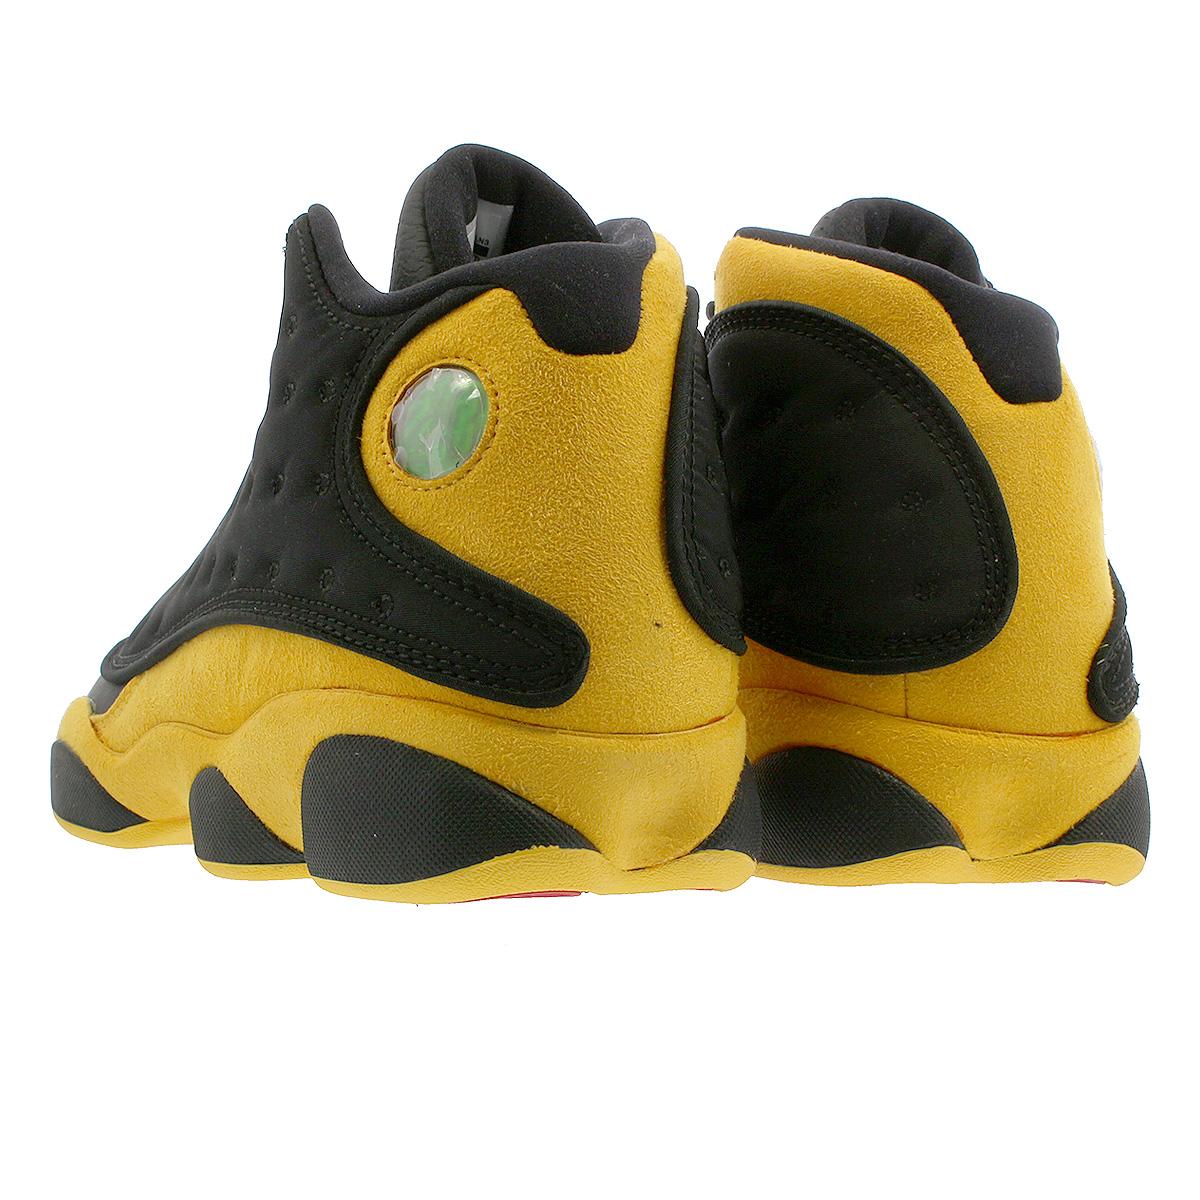 brand new 9c534 5383f NIKE AIR JORDAN 13 RETRO Nike Air Jordan 13 nostalgic BLACK/UNIVERSITY  RED/UNIVERSITY GOLD 414,571-035